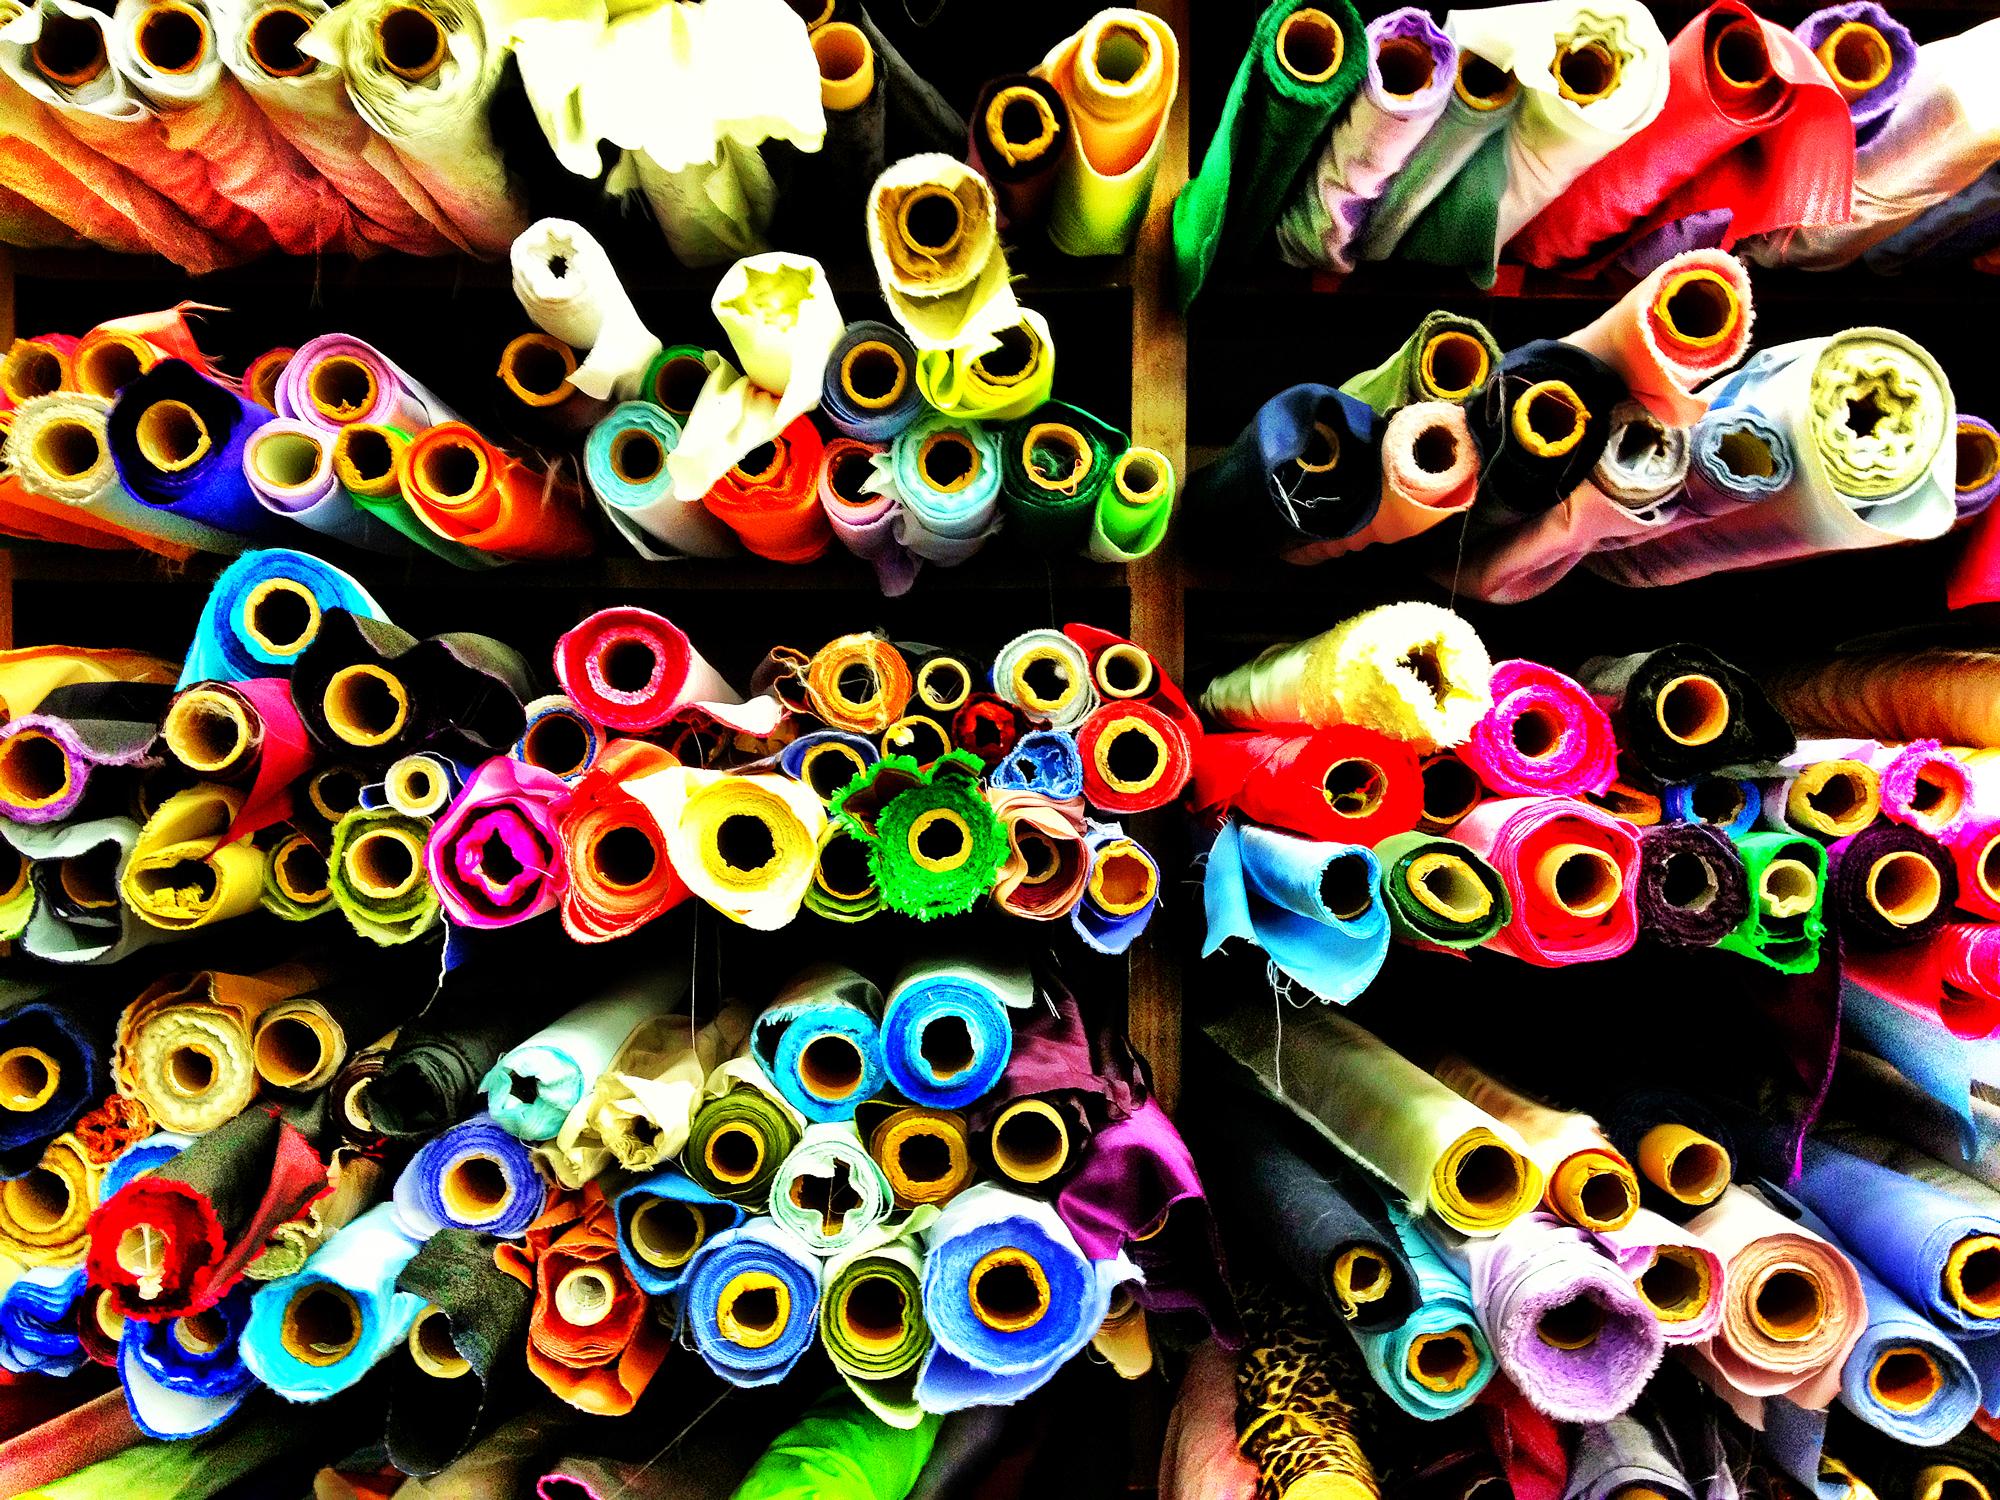 fabric_district_downtown_la.jpg